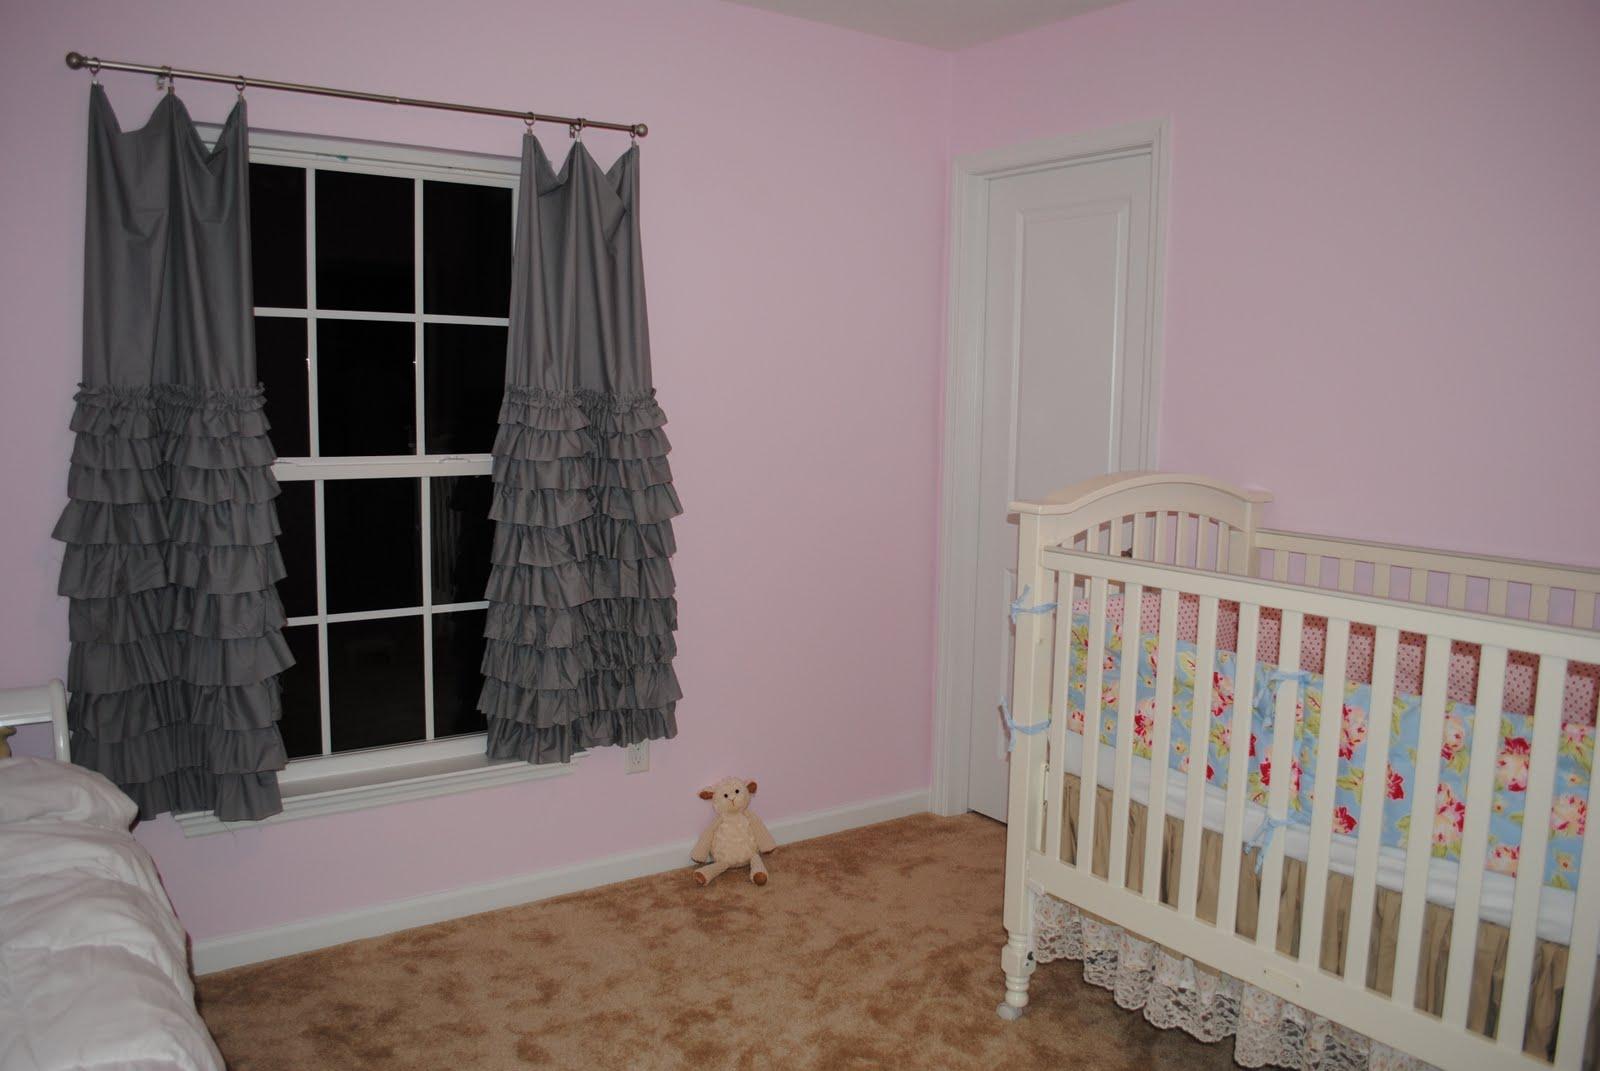 Ruffled curtains tutorial - Layered Ruffle Curtain Tutorial